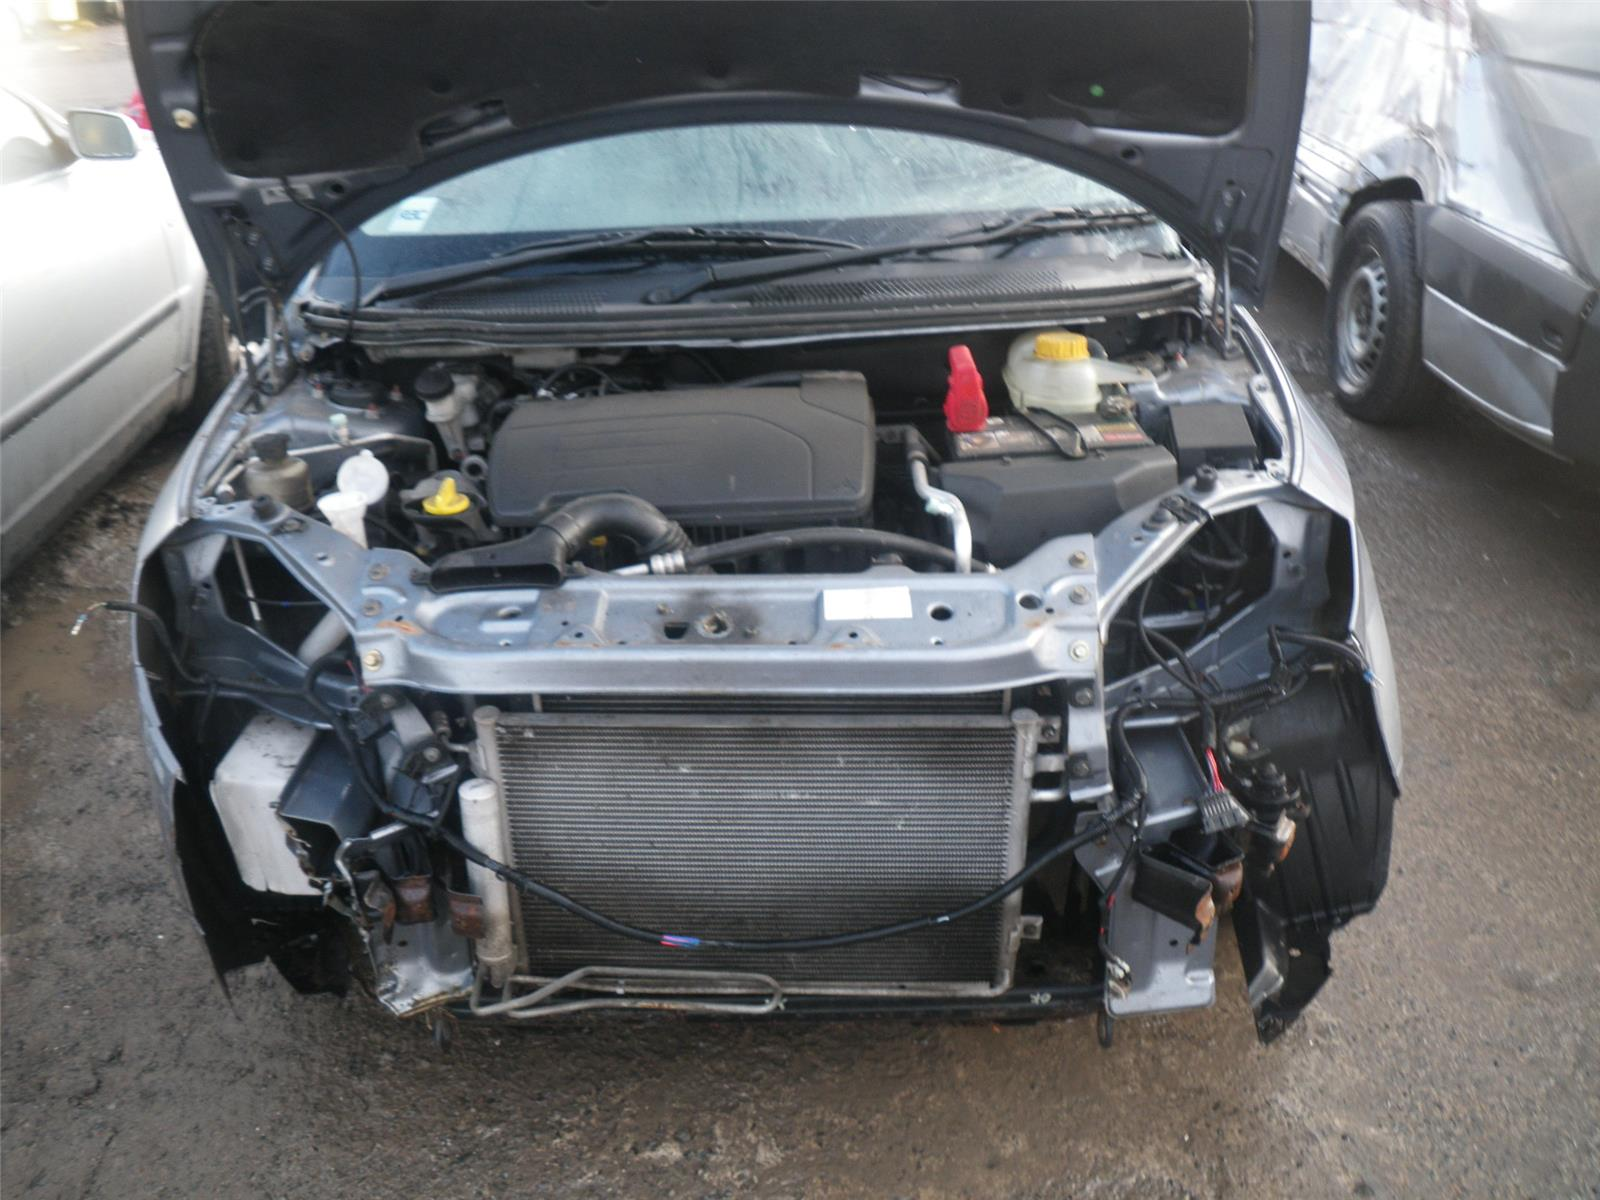 2007 proton savvy style 5 door hatchback petrol manual breaking rh burnsidemotors co uk 07 Proton Savvy UK Proton Savvy